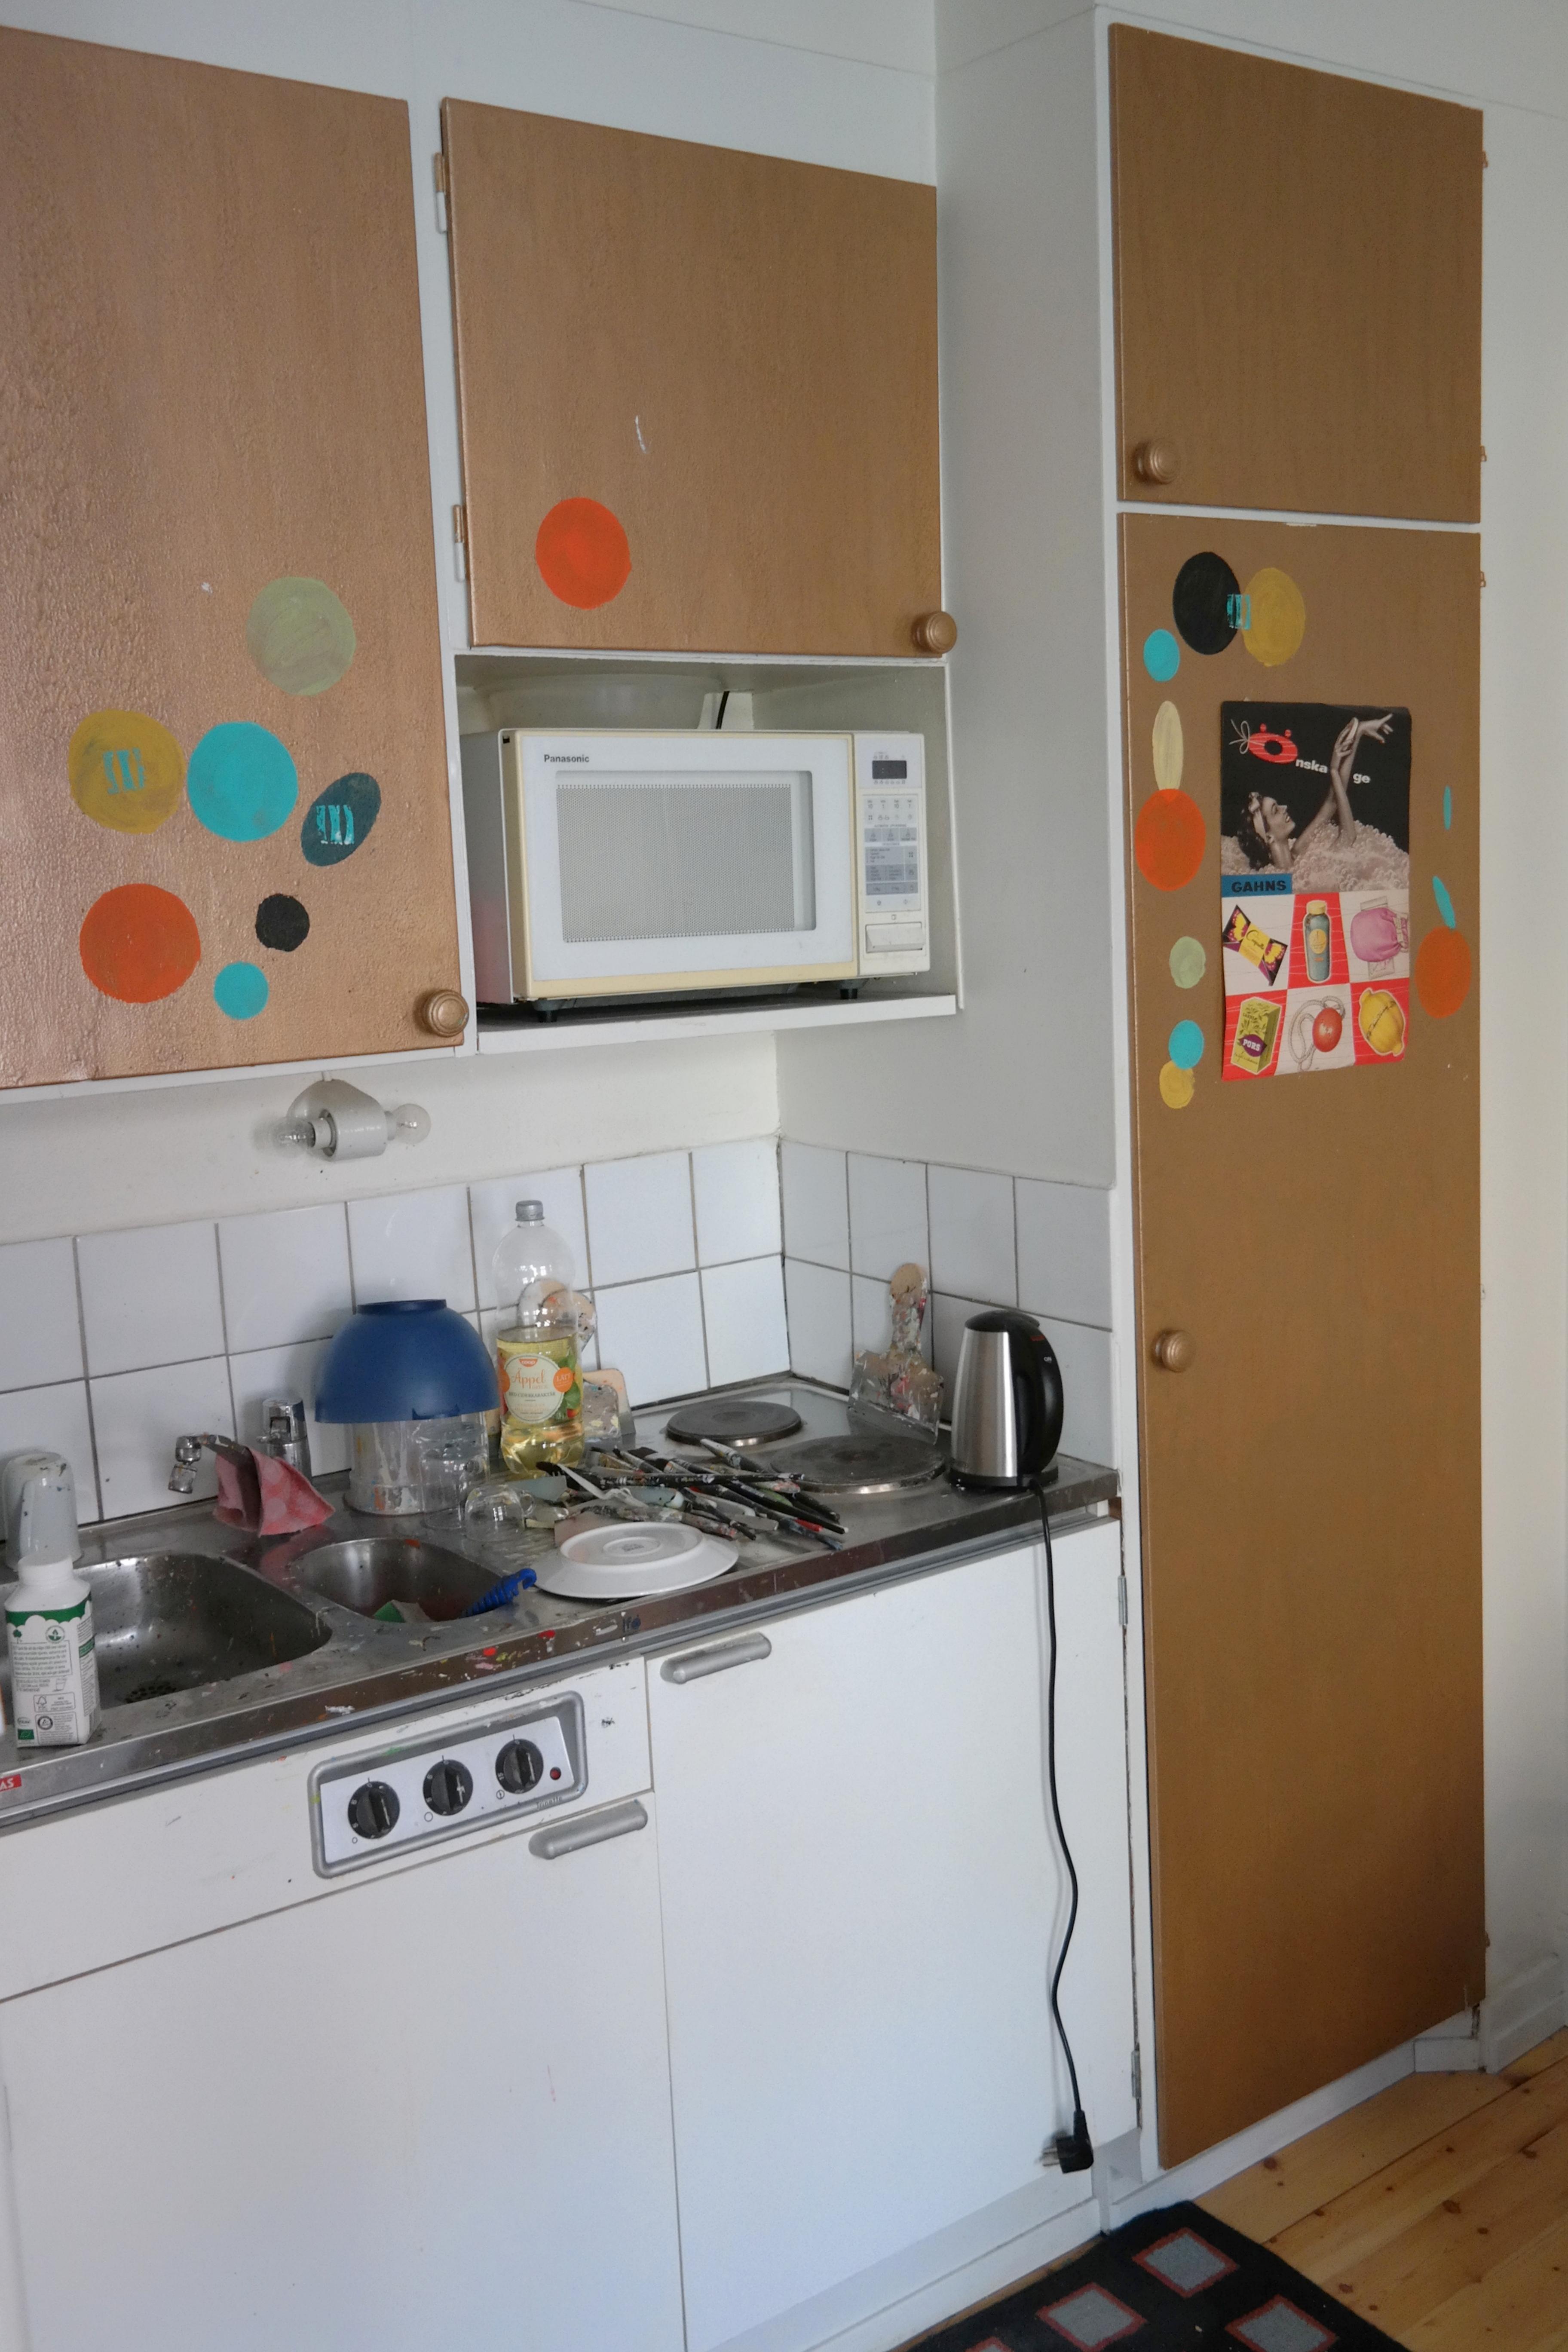 Studio, Krukmakargatan